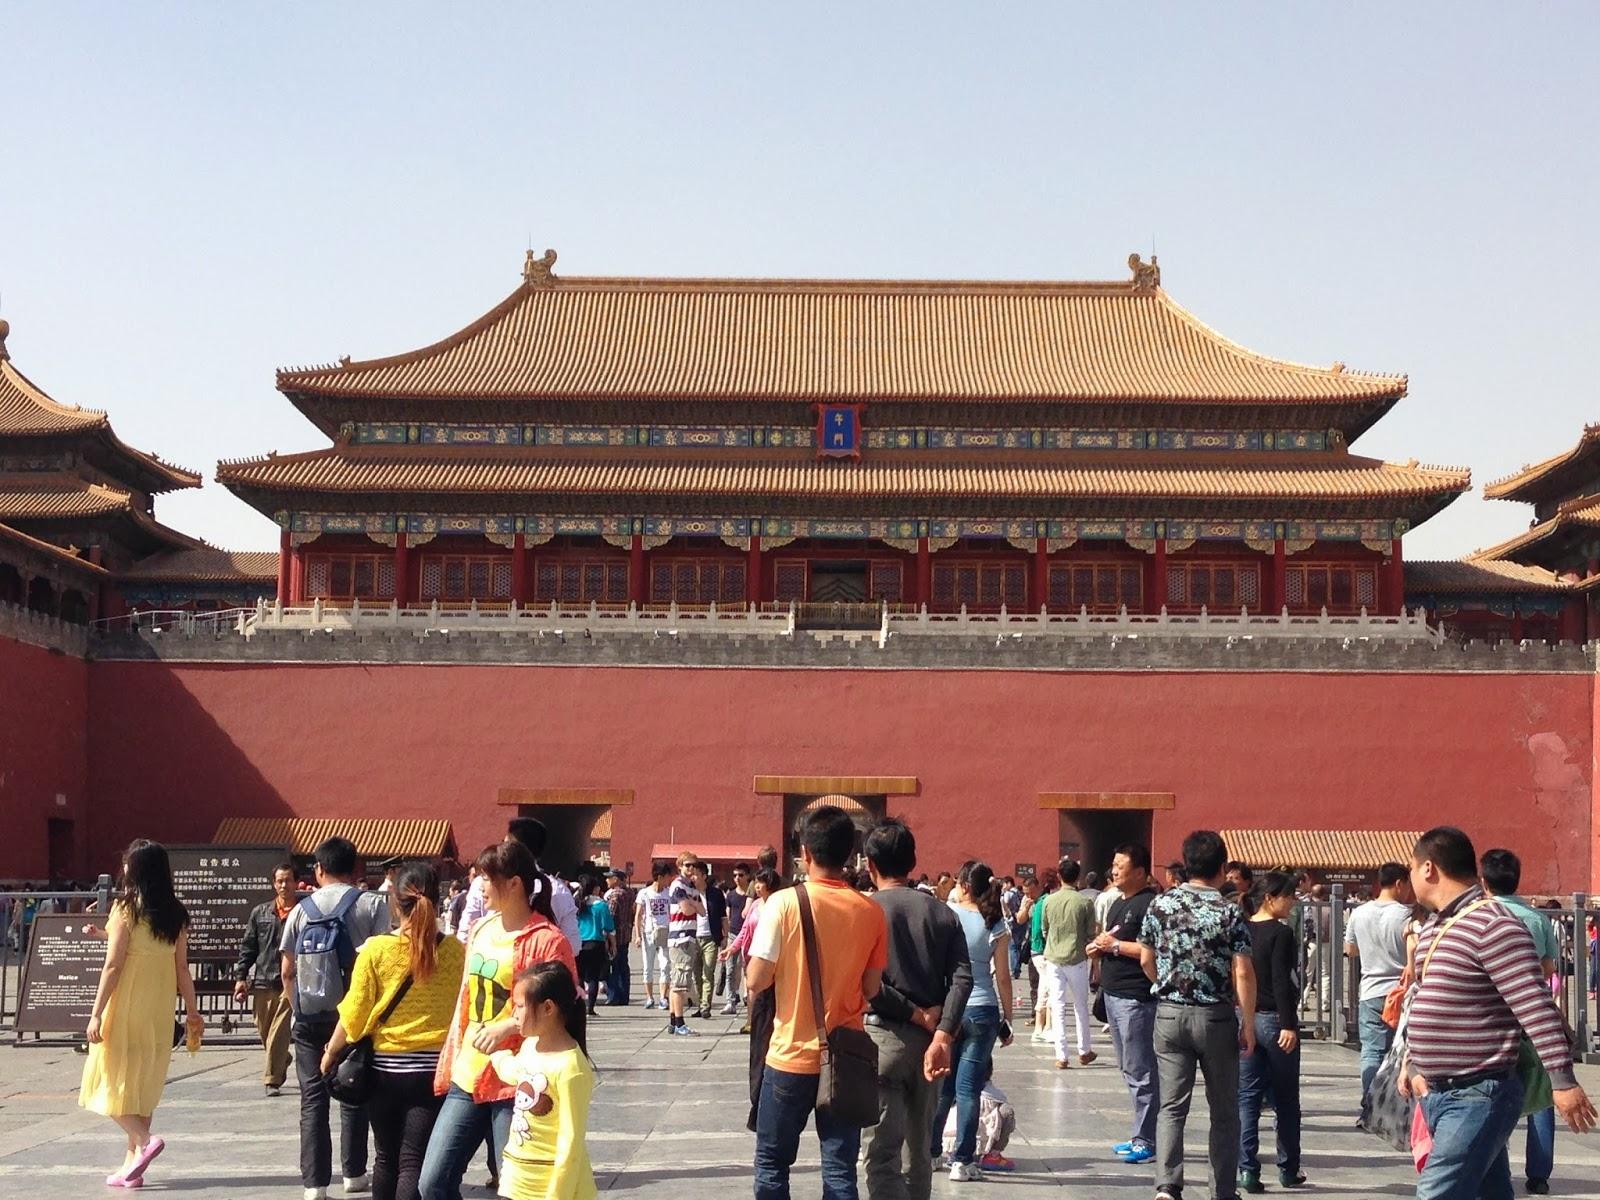 China. Forbidden City. Beijing. The Dragon Trip